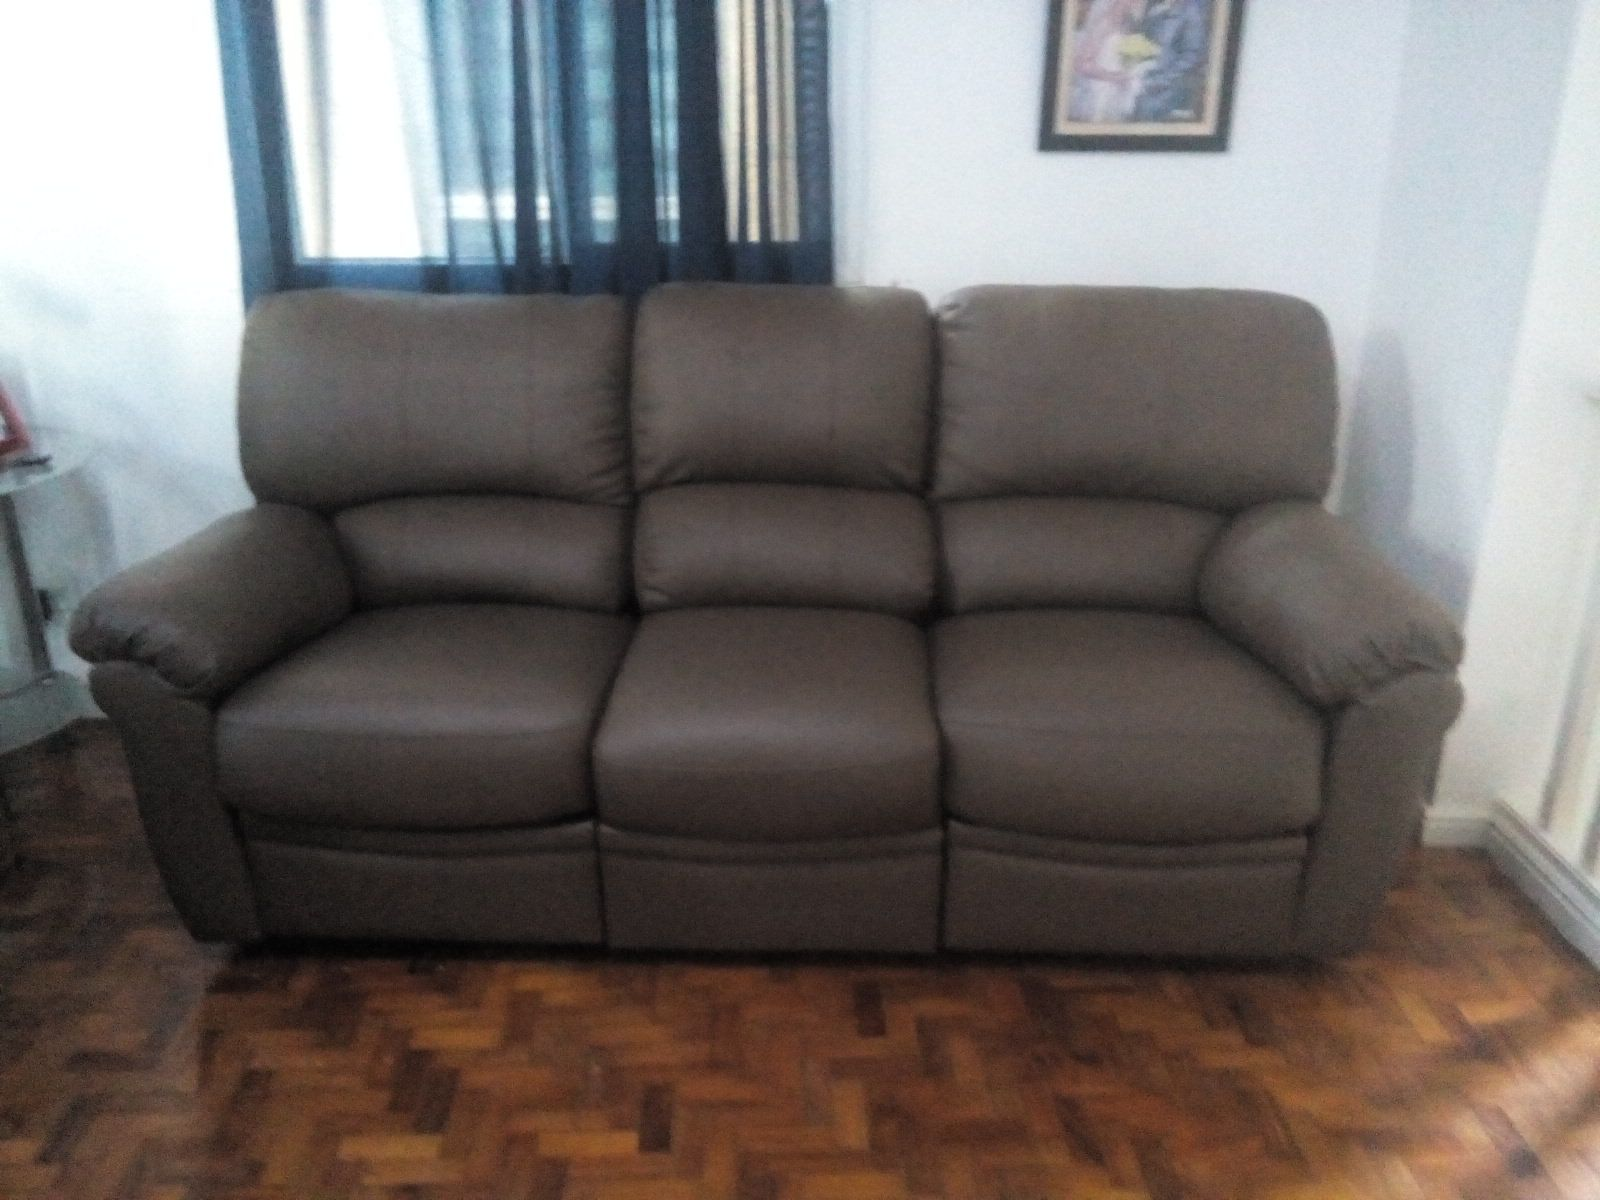 Seater Recliner Sofa Leather Soft Cedar